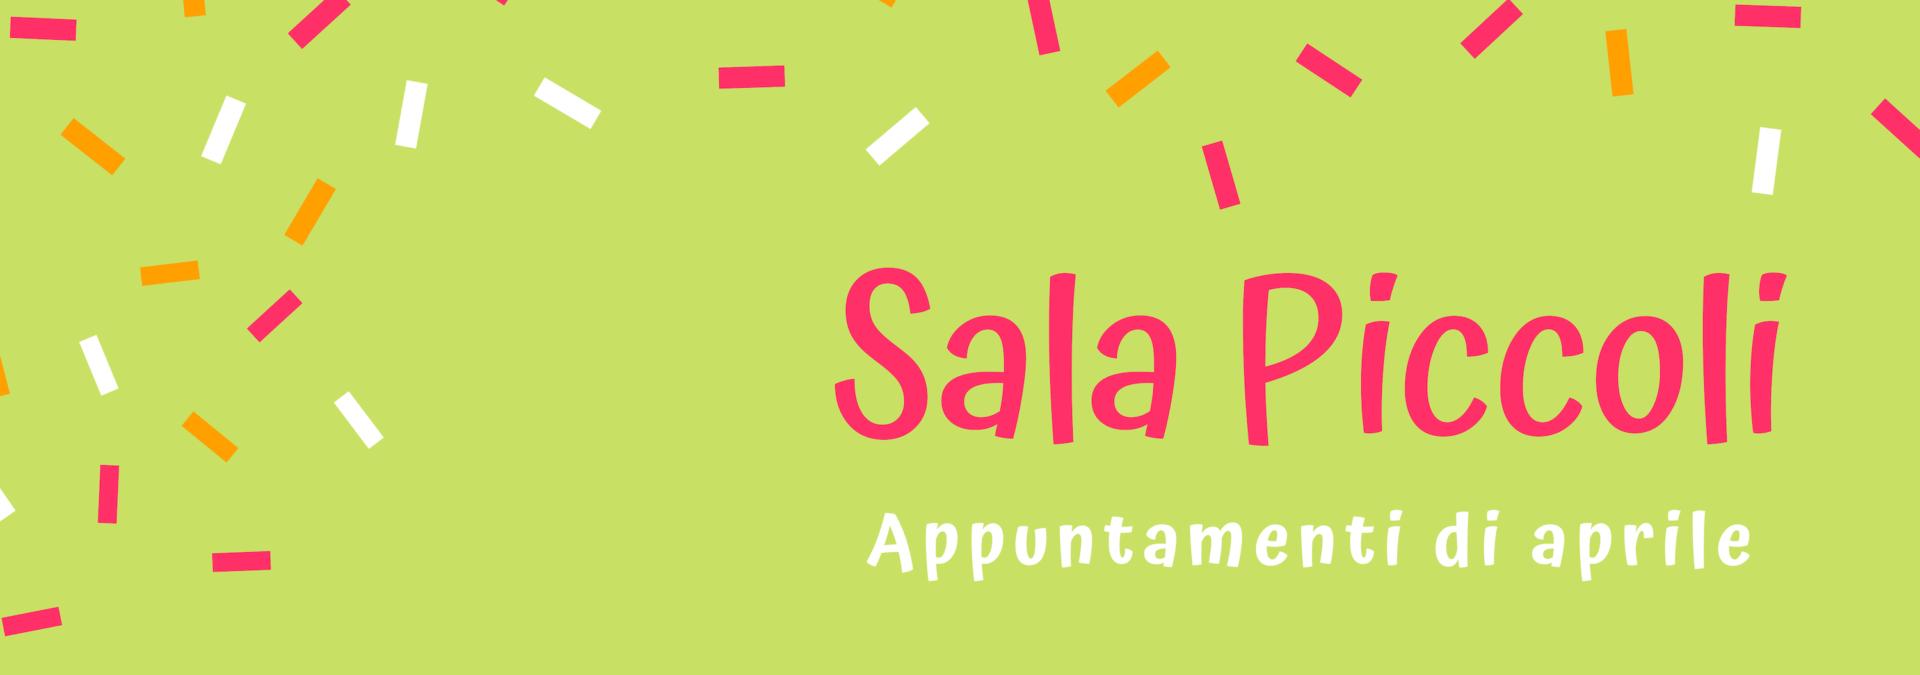 Appuntamenti di aprile in Sala Piccoli